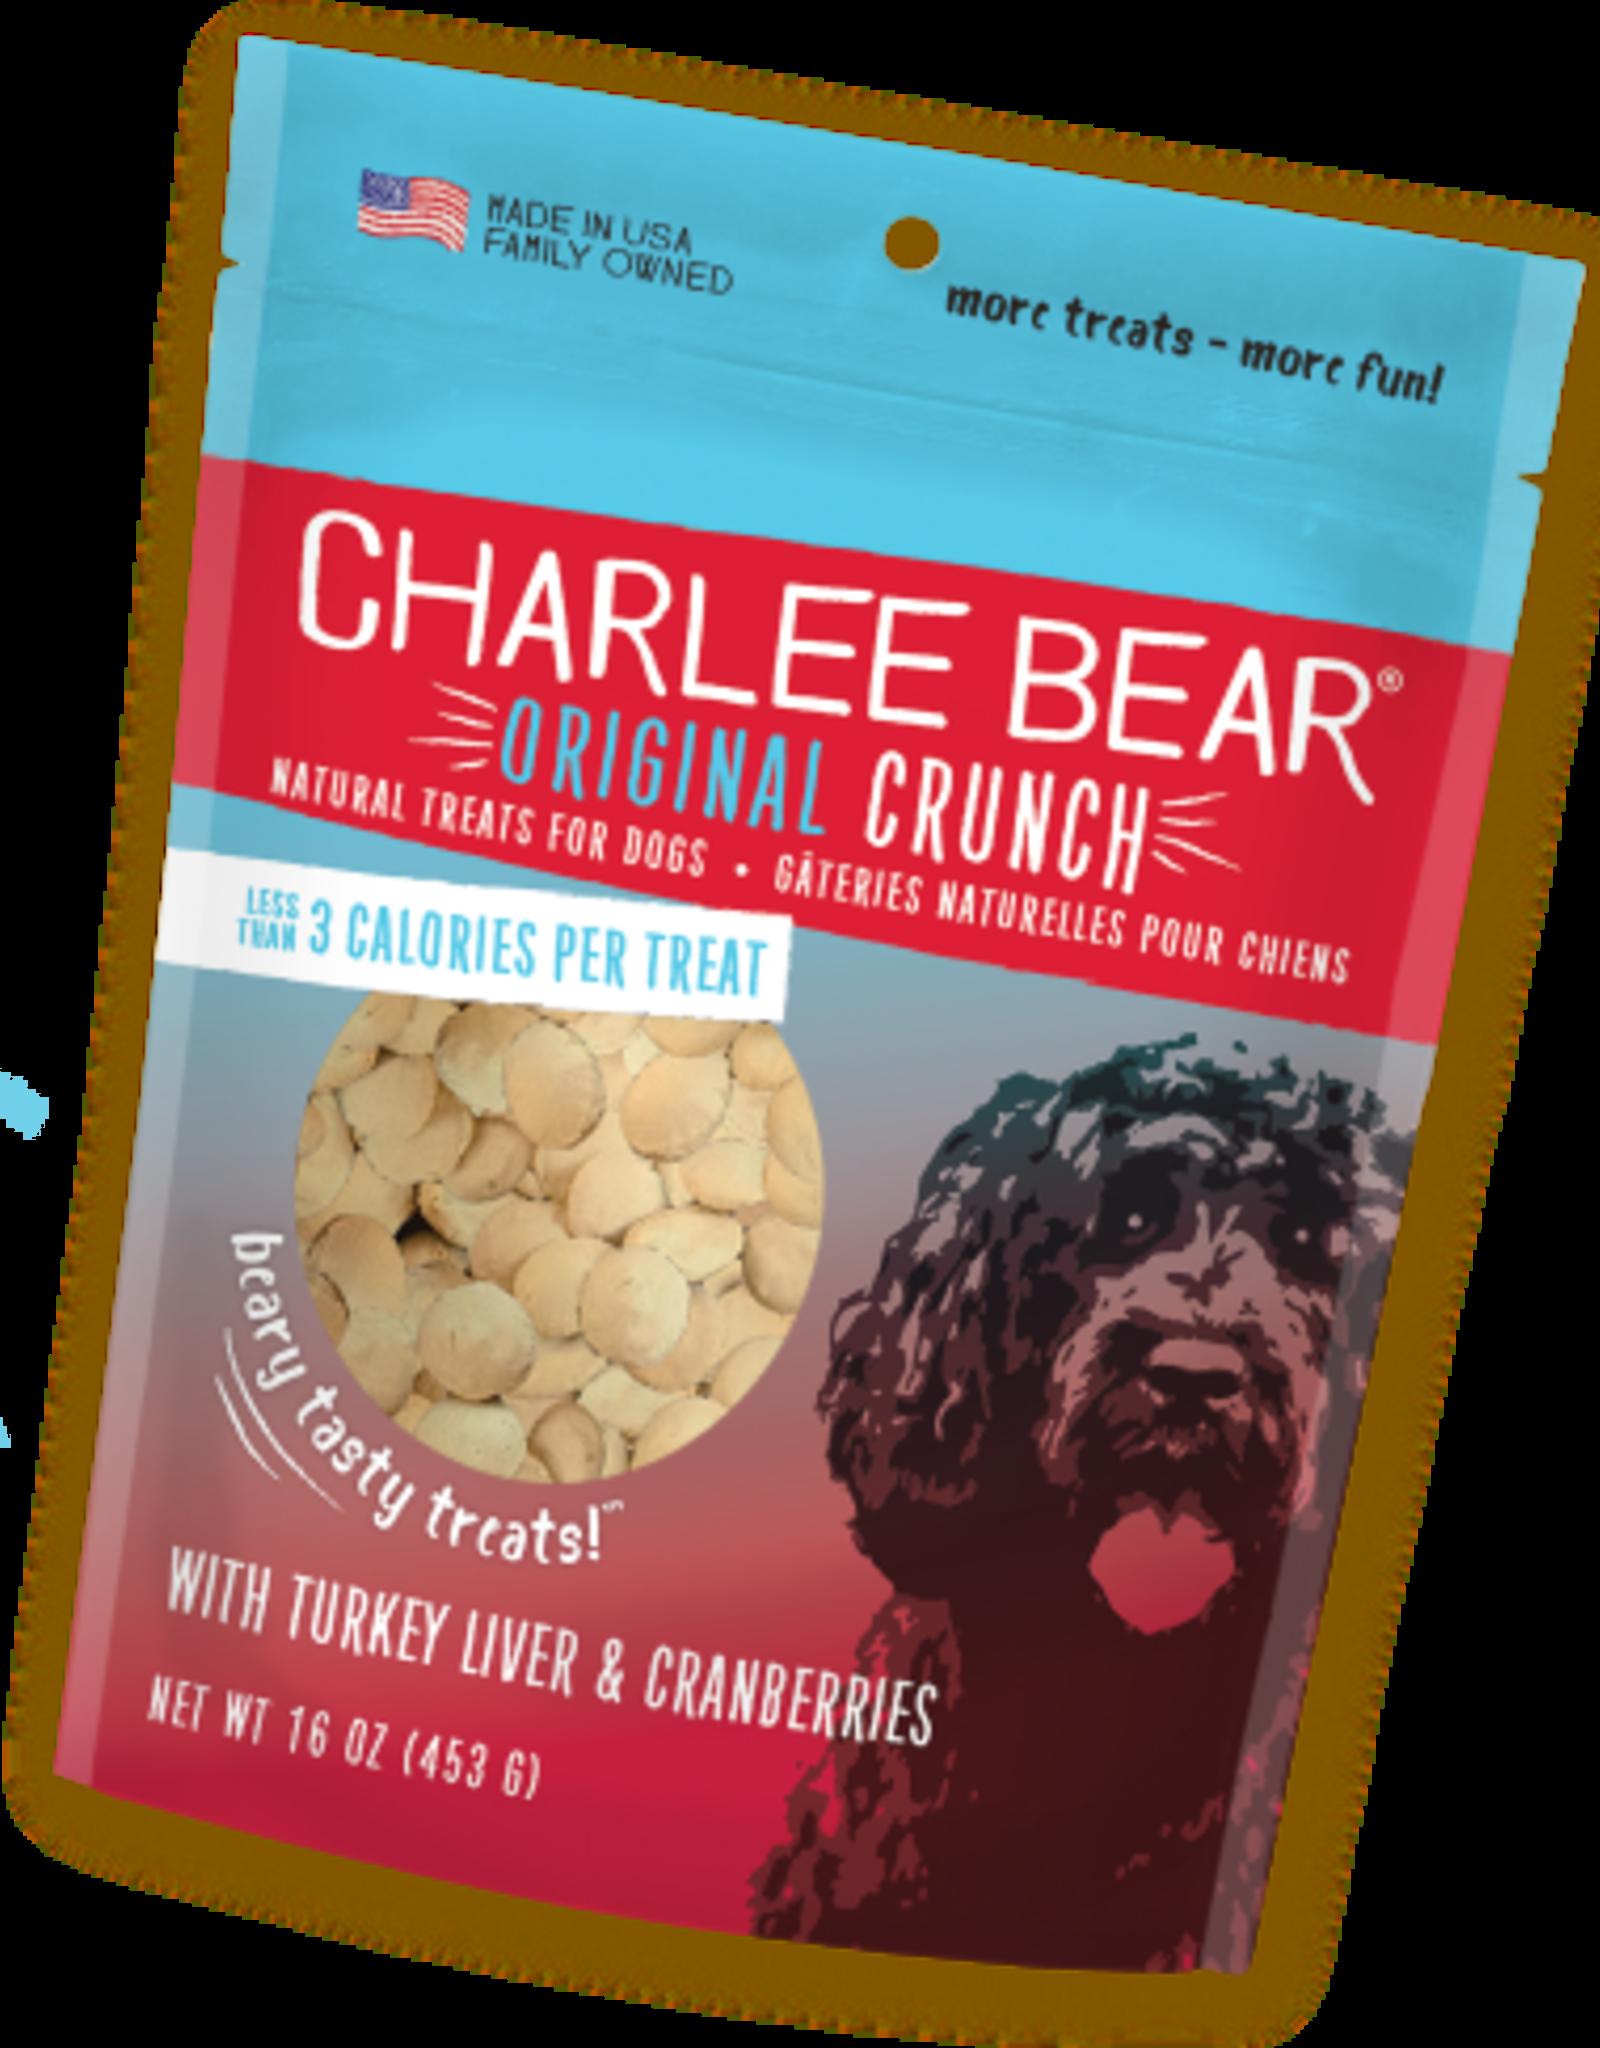 CHARLEE BEAR CHARLEE BEAR DOG TREATS TURKEY LIVER W/CRANBERRY 16OZ